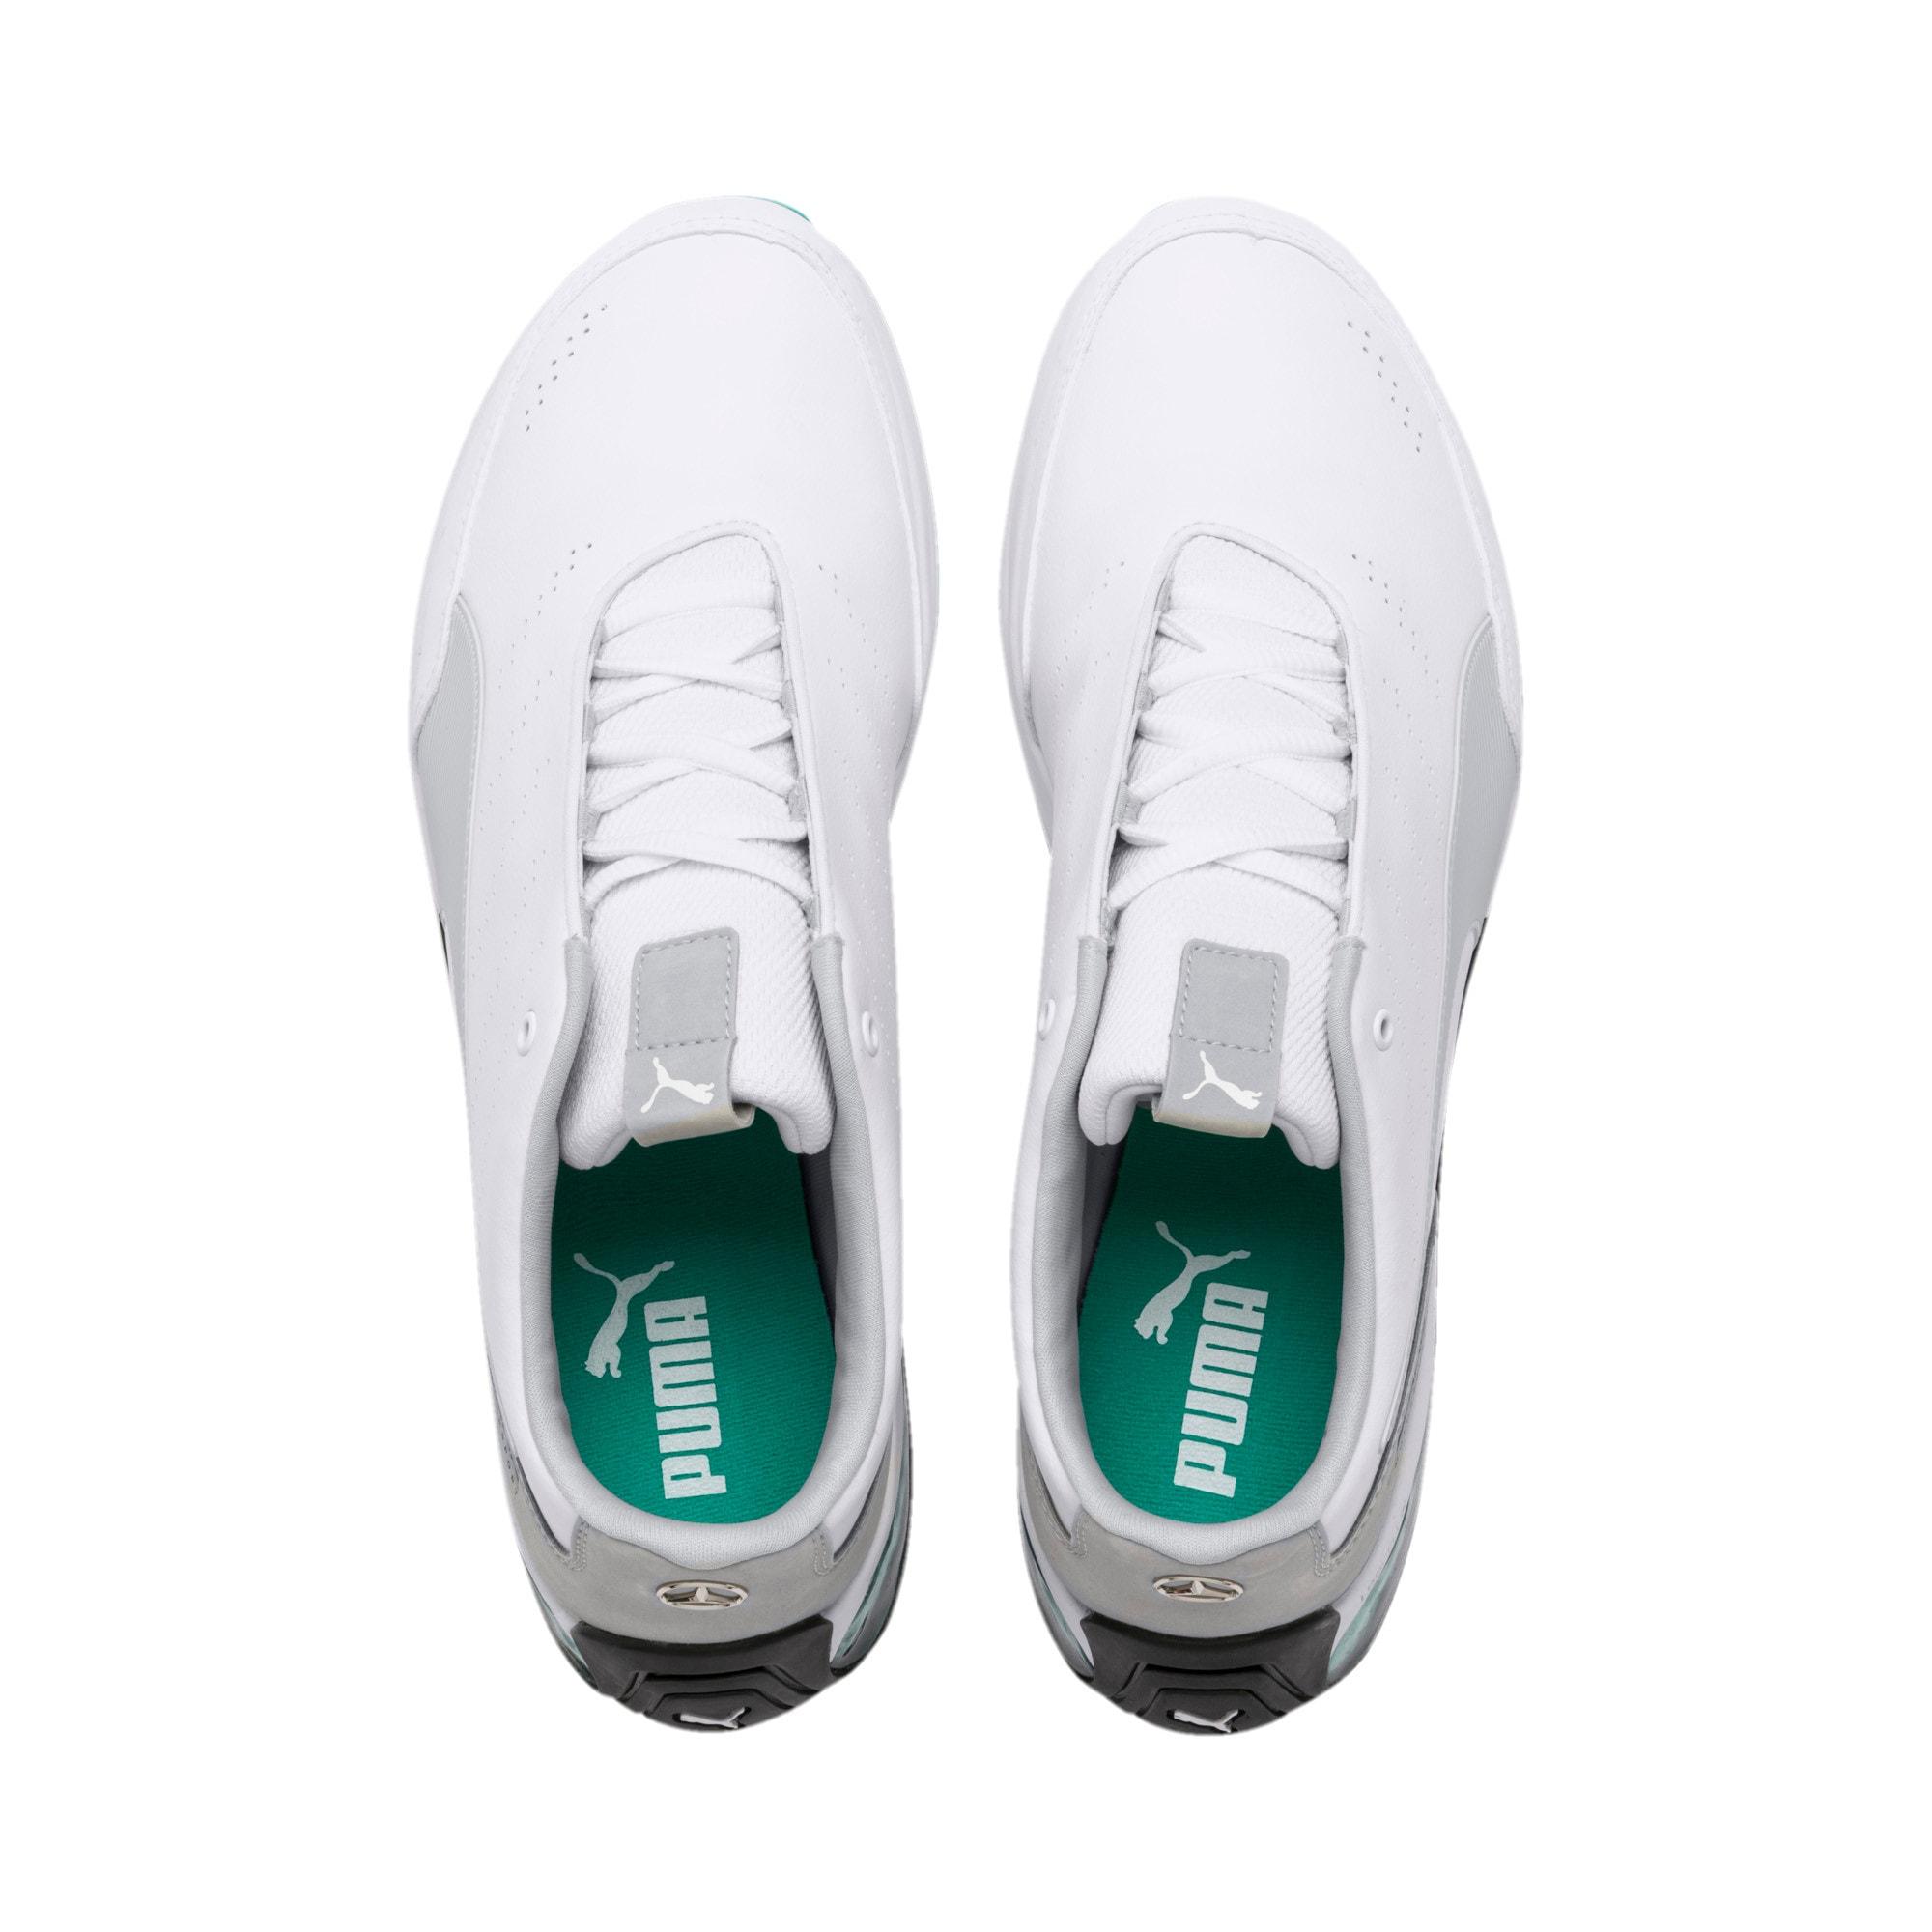 Thumbnail 7 of Mercedes AMG Petronas Kart Cat X Men's Training Shoes, Puma White-Mercedes Silver, medium